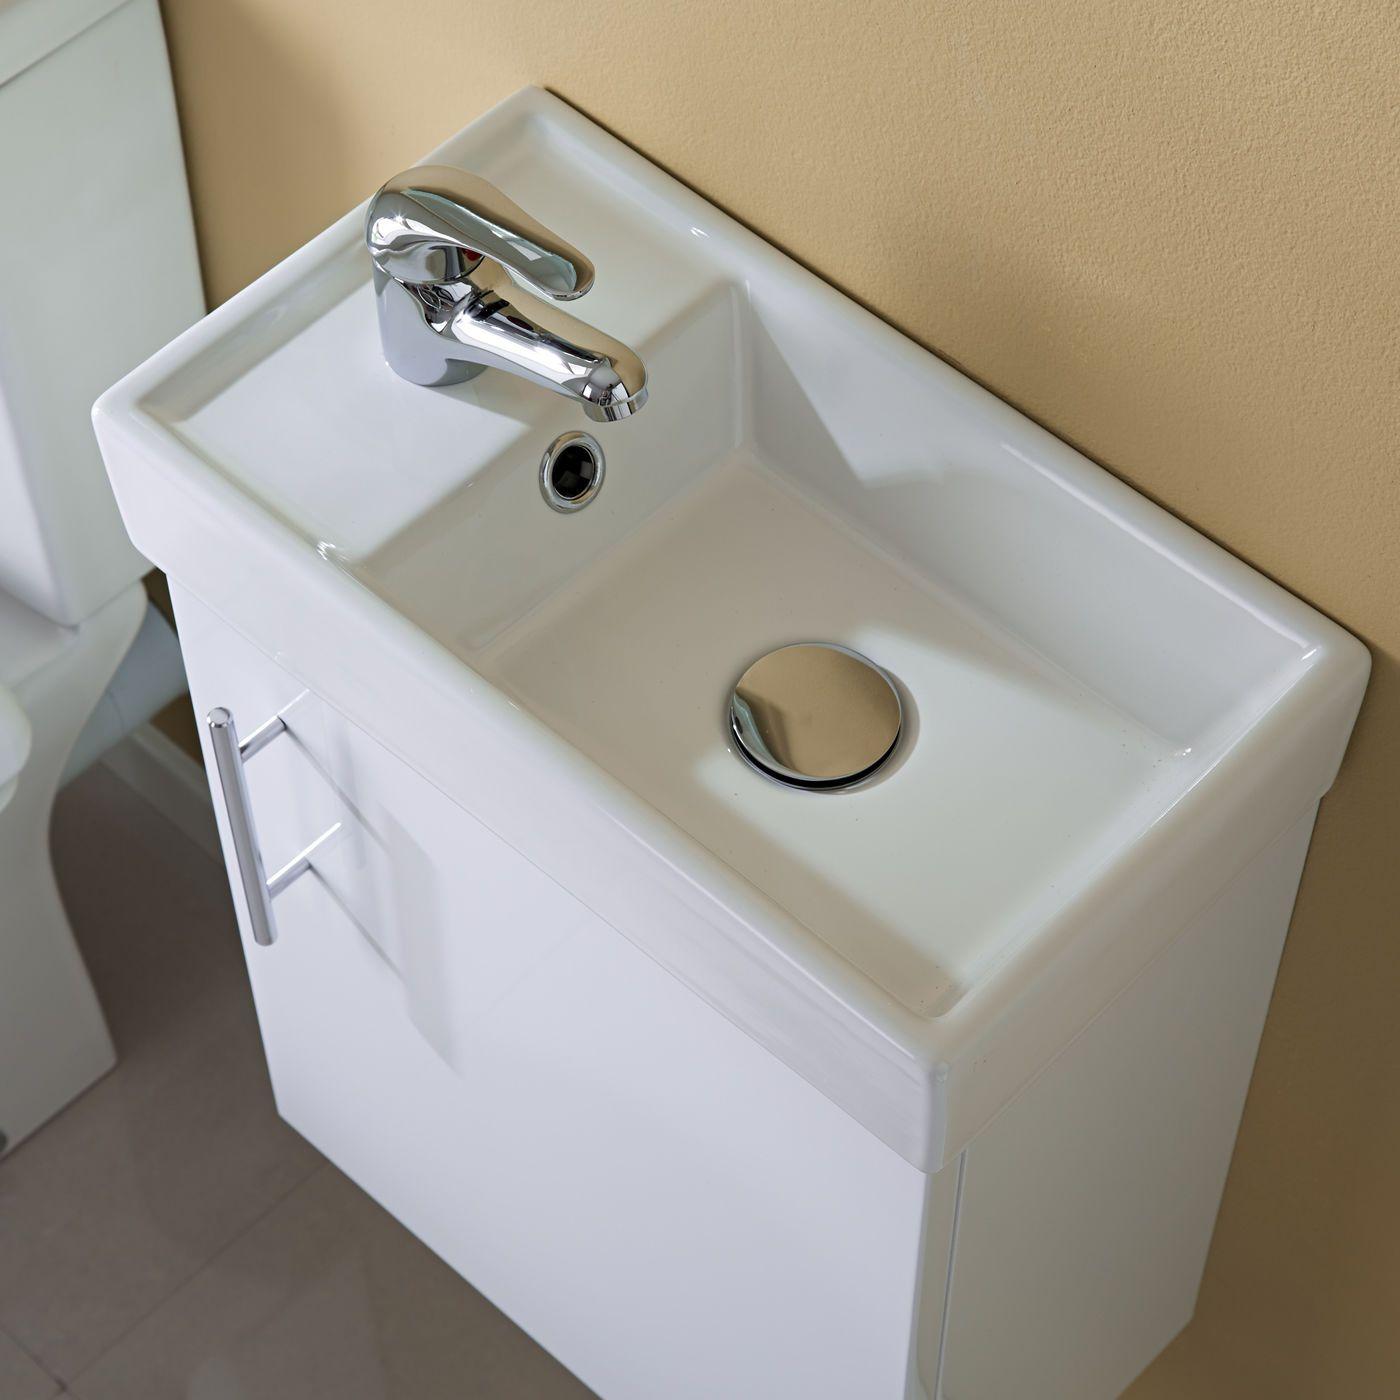 Designer Vanity Units For Bathroom Magnificent 400Mm Modern White Compact Wall Hung Vanity Unit Bathroom Inspiration Design